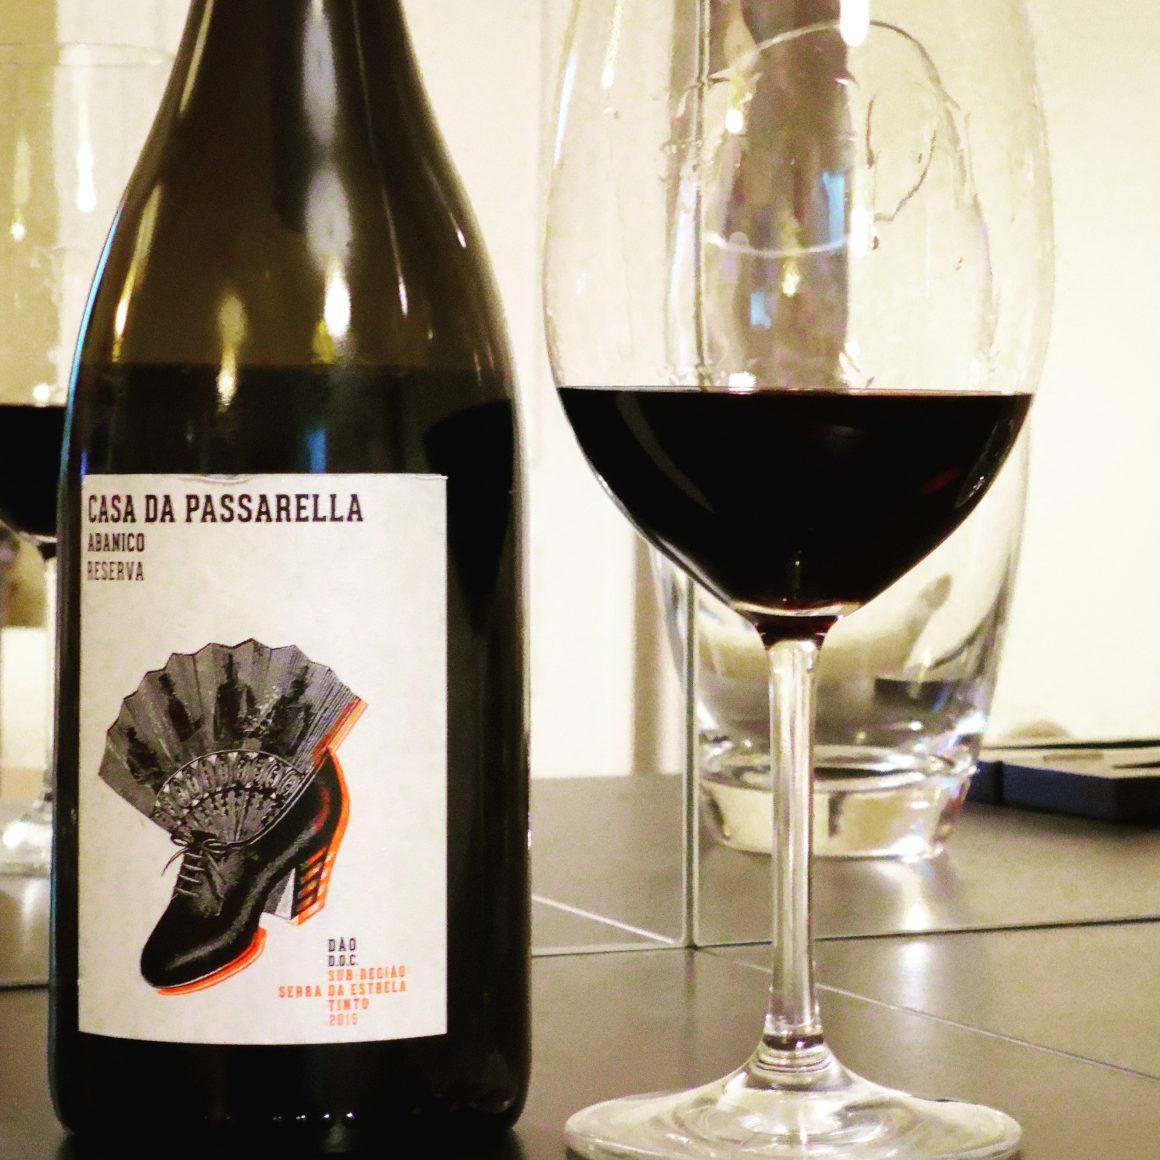 Casa da Passarella Abanico Reserva 2015 - Viva o Vinho